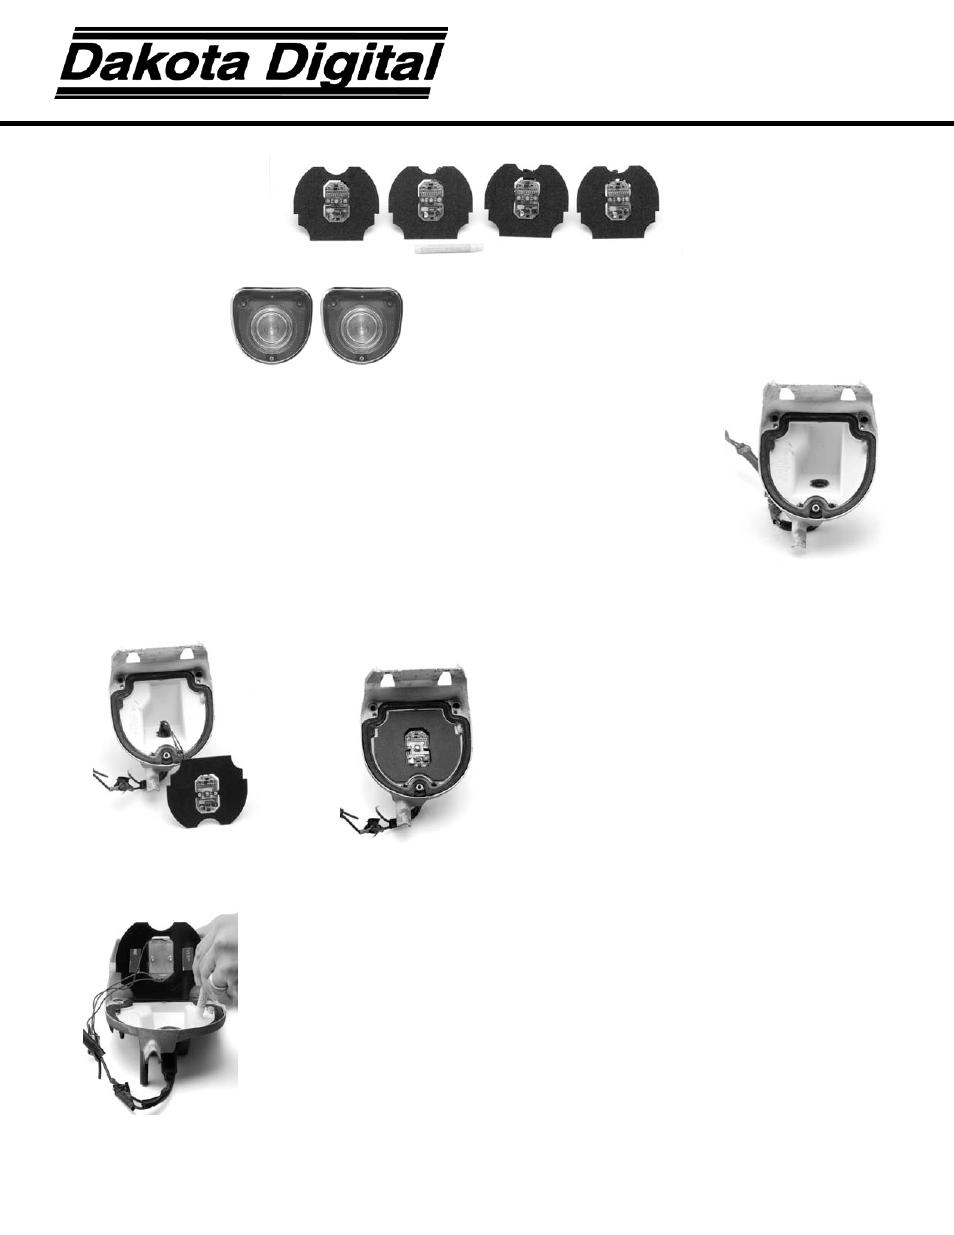 Dakota Digital LED Tail Lights for 1968 Impala LAT-NR251 User Manual | 2  pages